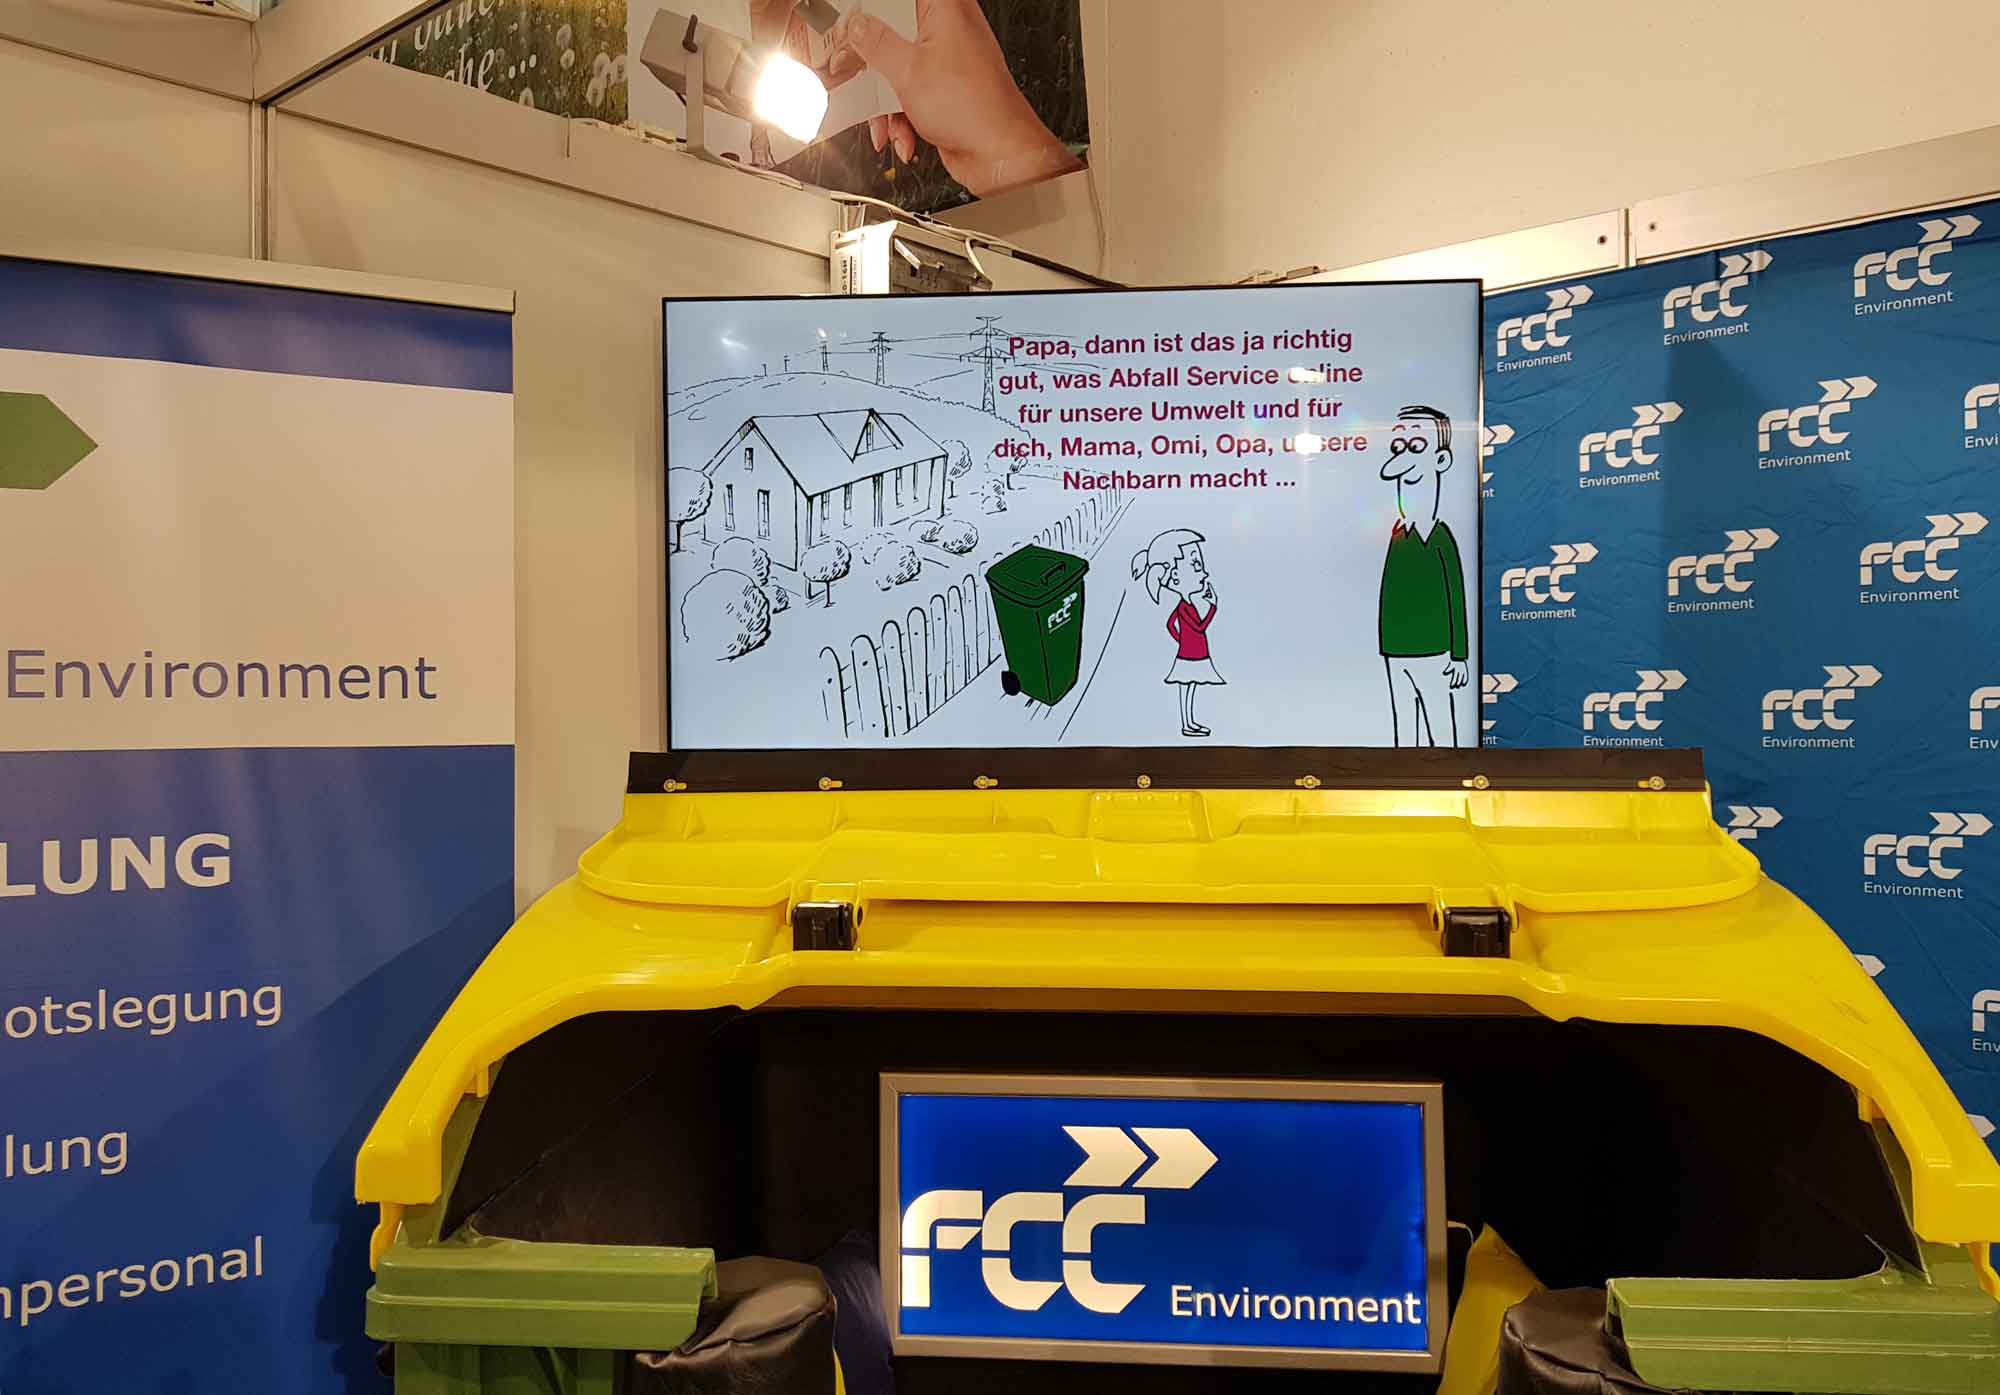 fcc-video-abfall-service-online-abfall-entsorgung-haeuselbauermesse-graz